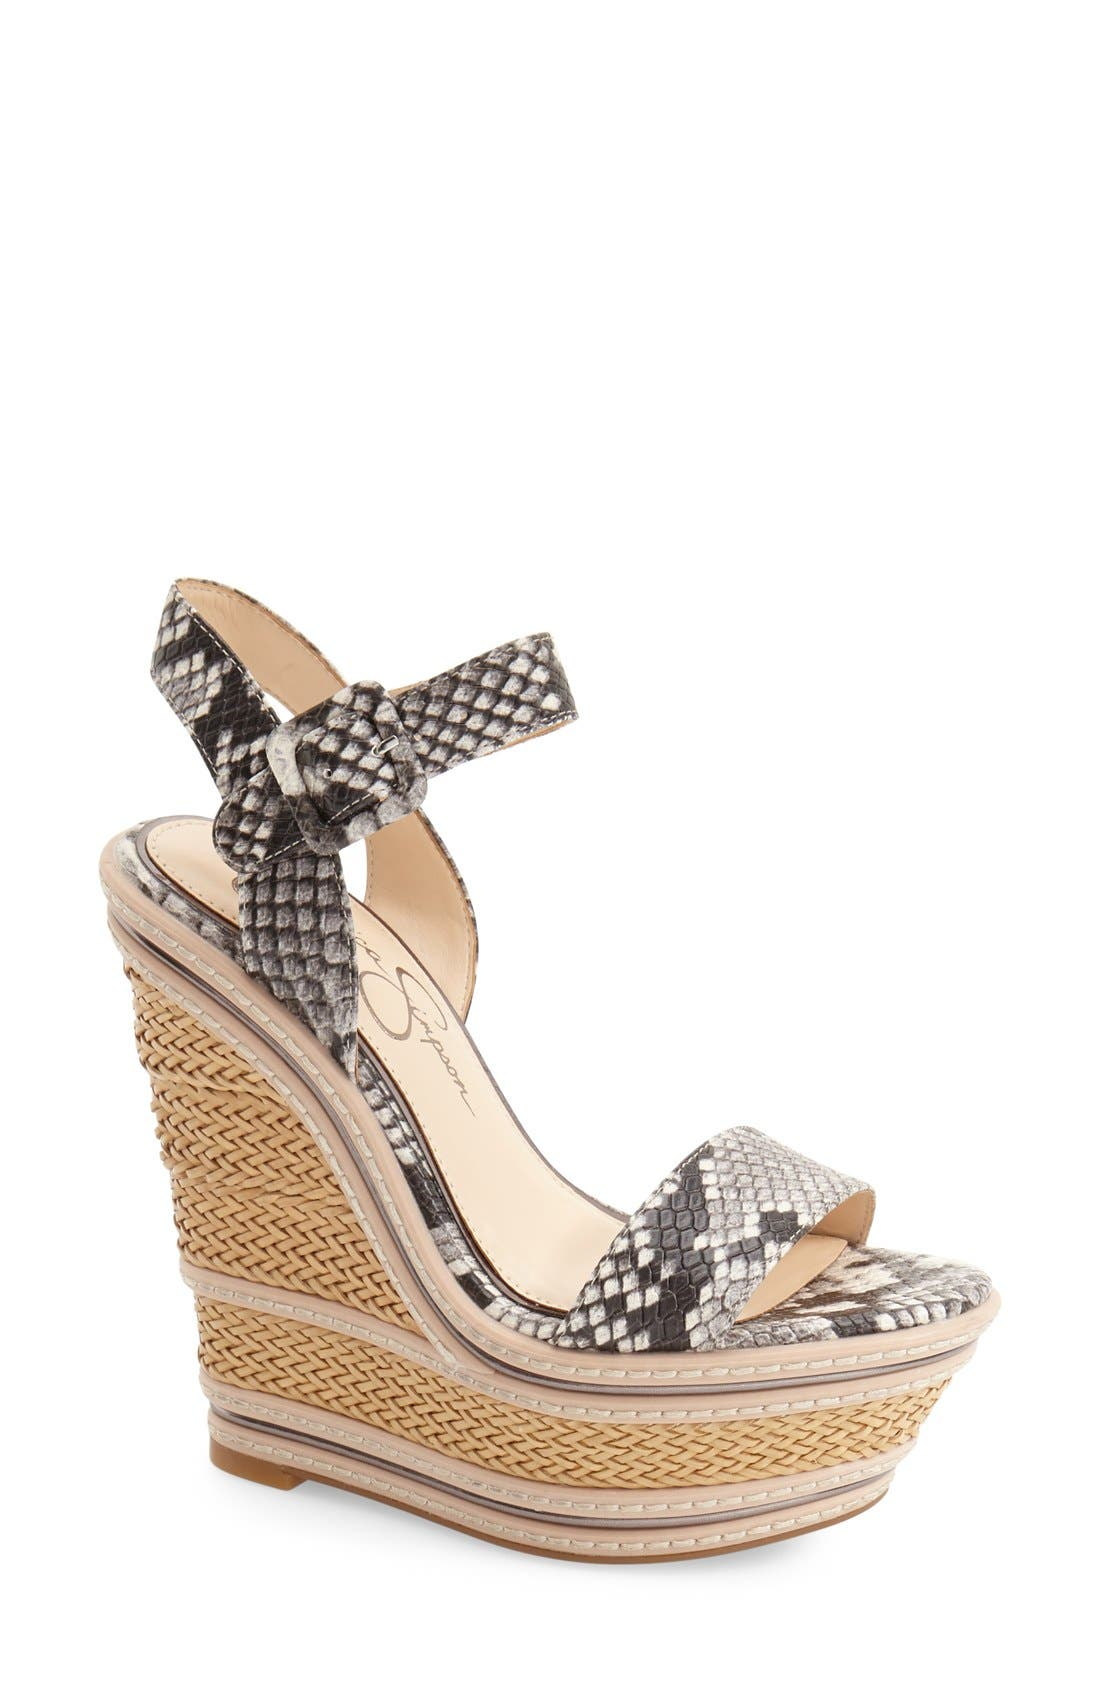 Alternate Image 1 Selected - Jessica Simpson 'Ayala' Wedge Sandal (Women)